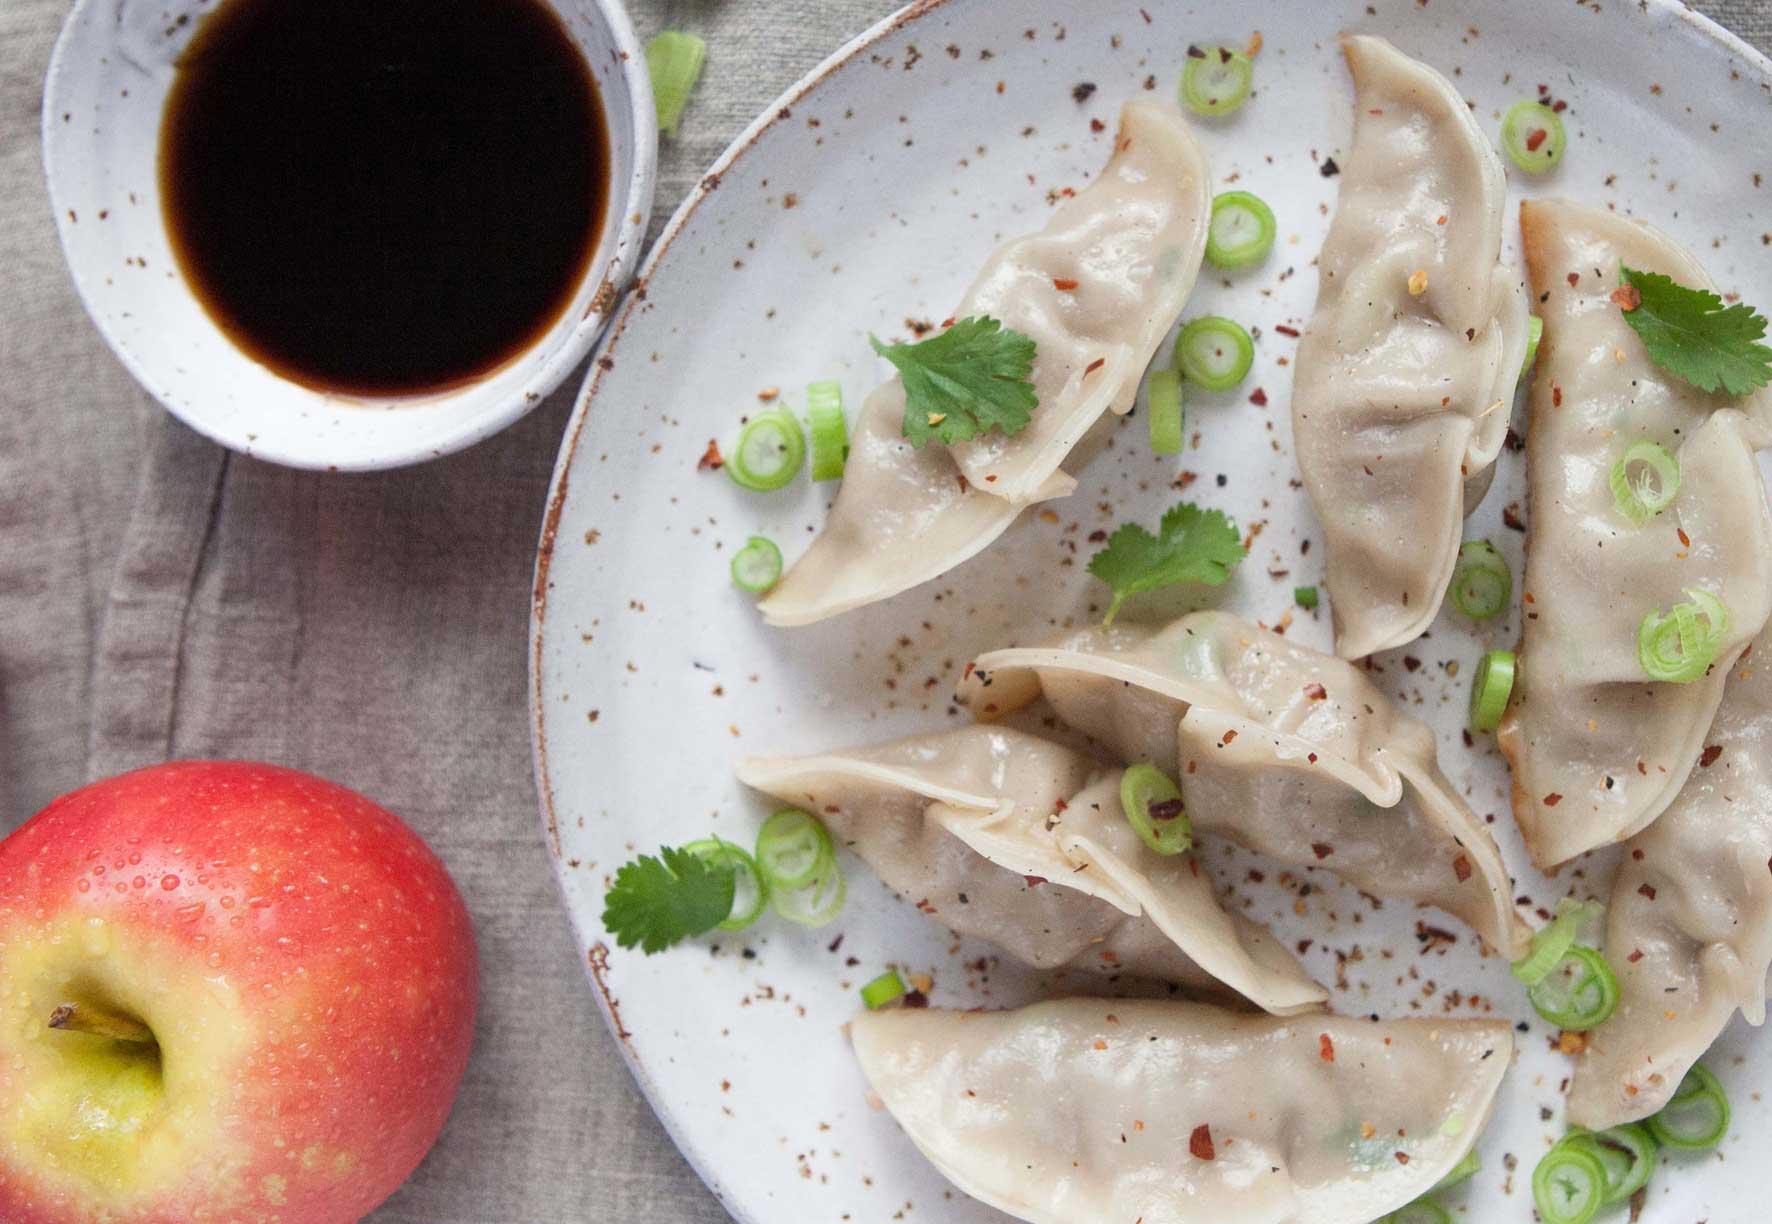 Dumplings1.jpg